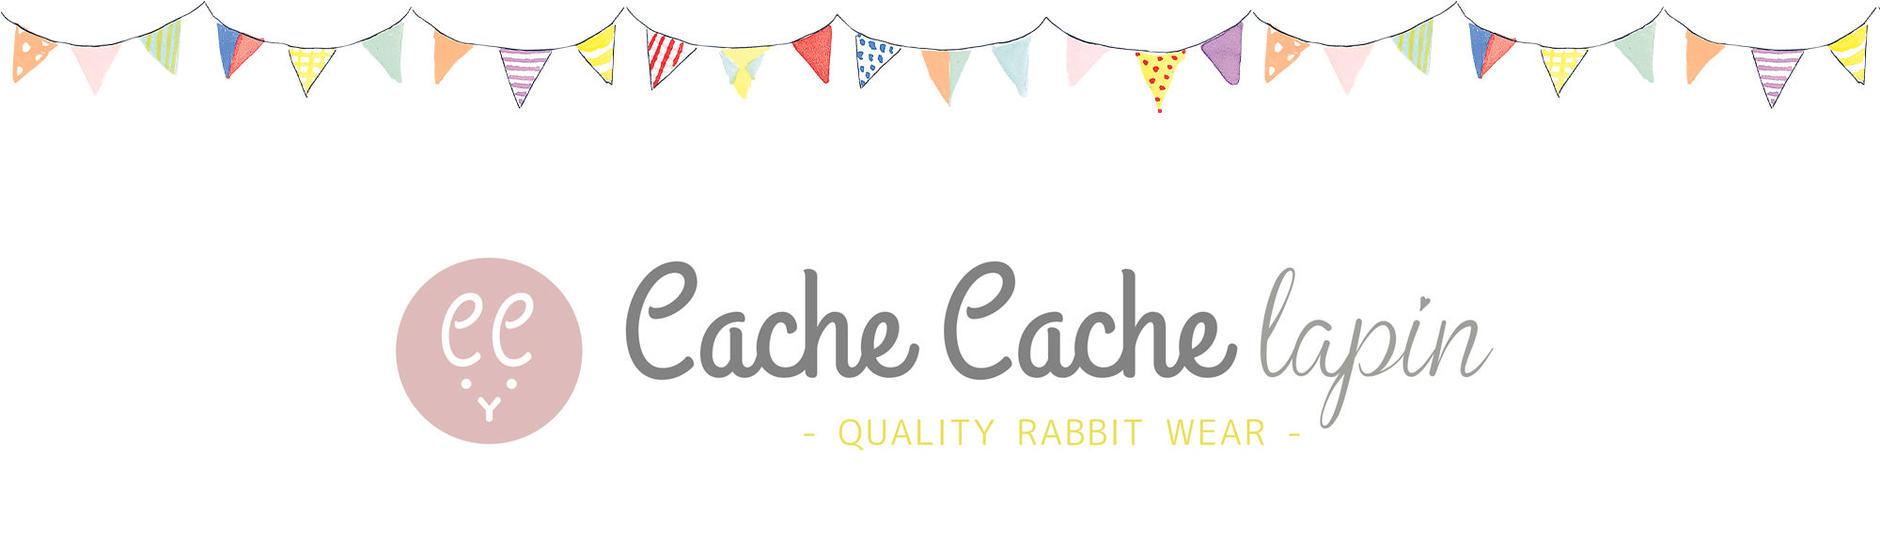 「CacheCache lapin -Quality Rabbit Wear-」